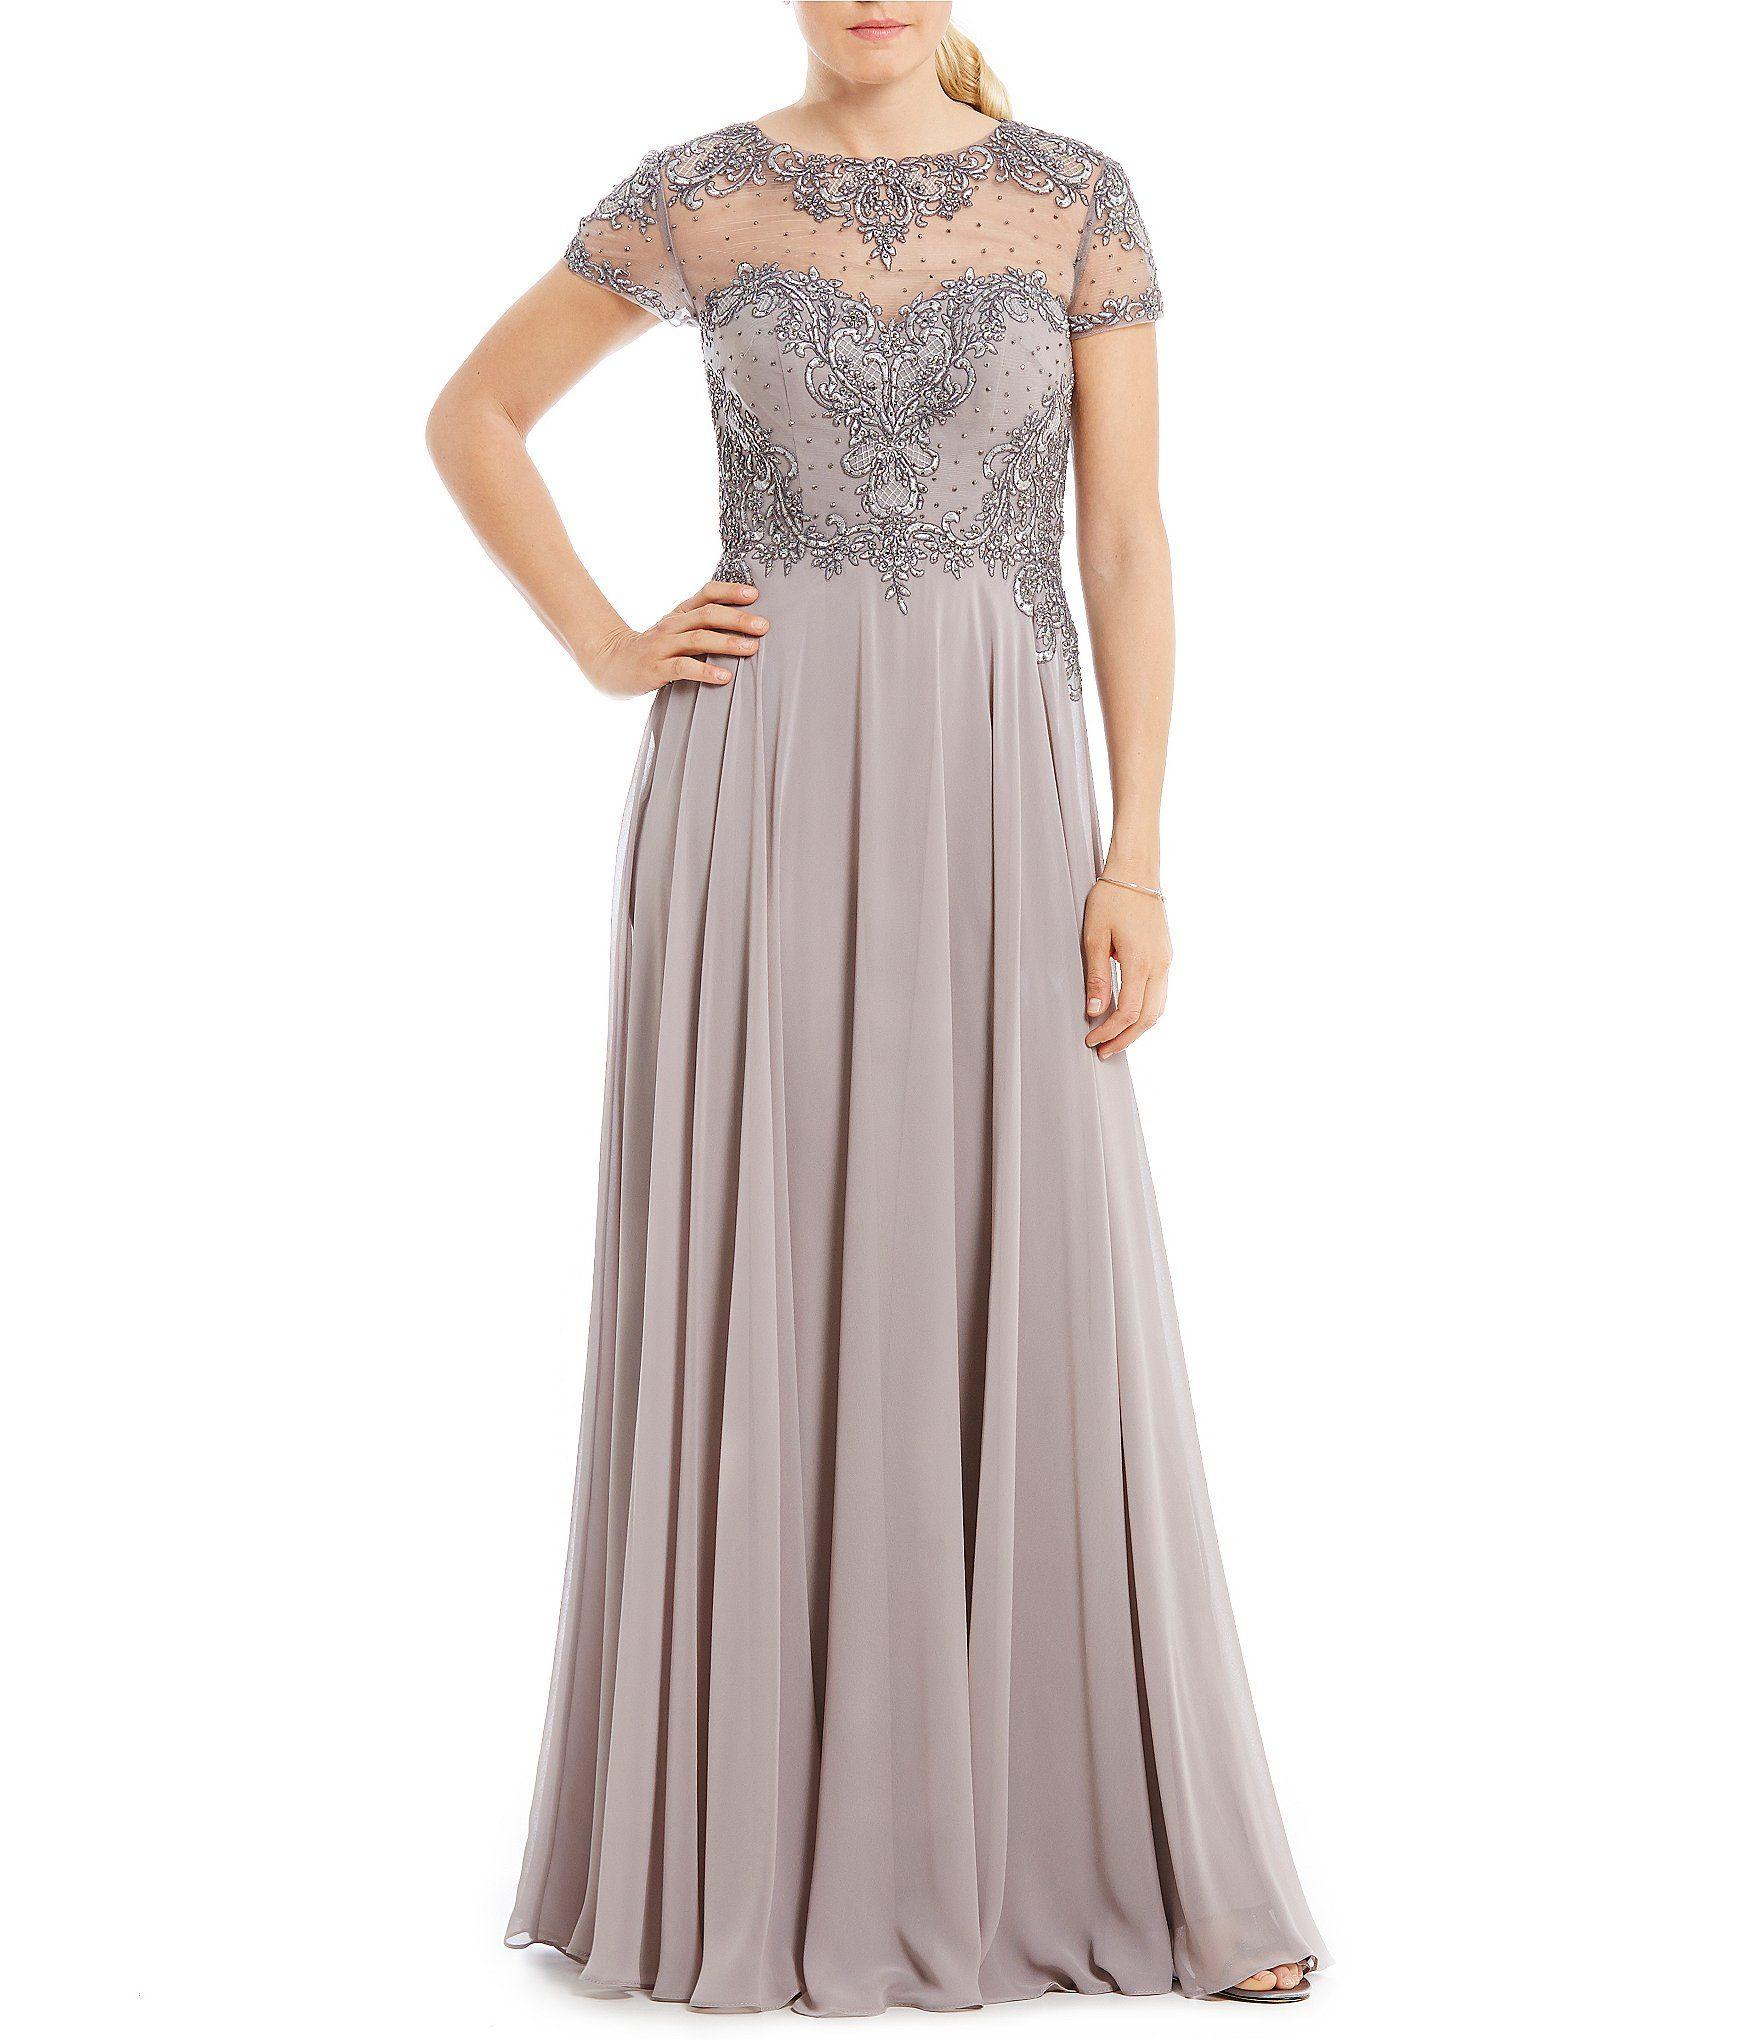 MGNY Madeline Gardner New York Beaded Bodice Chiffon Gown #Dillards ...